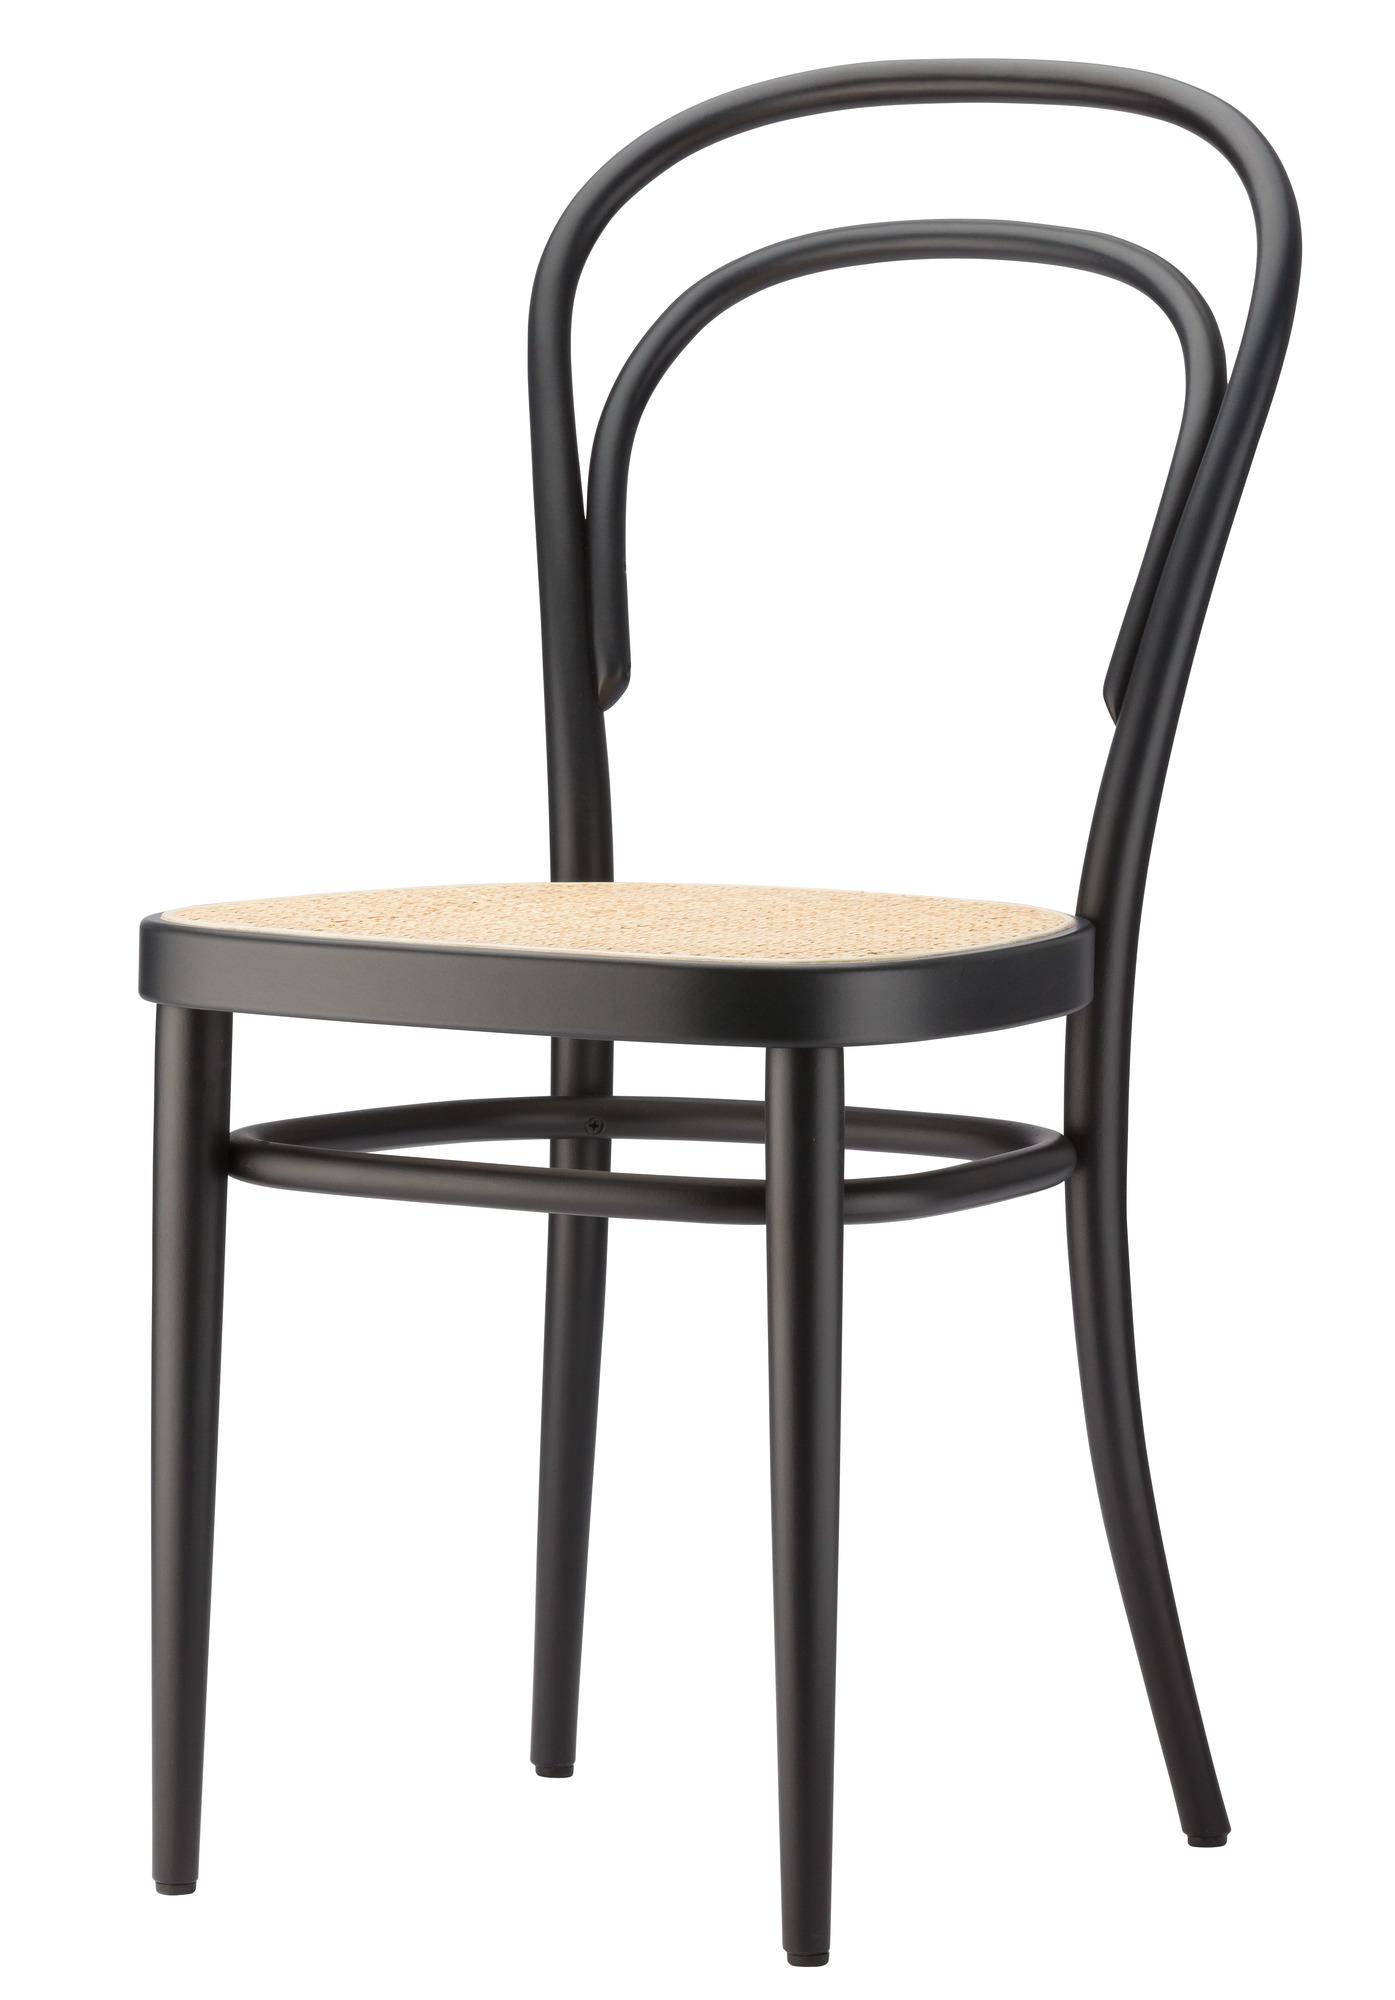 214 Bentwodd Chair - Café chair Thonet